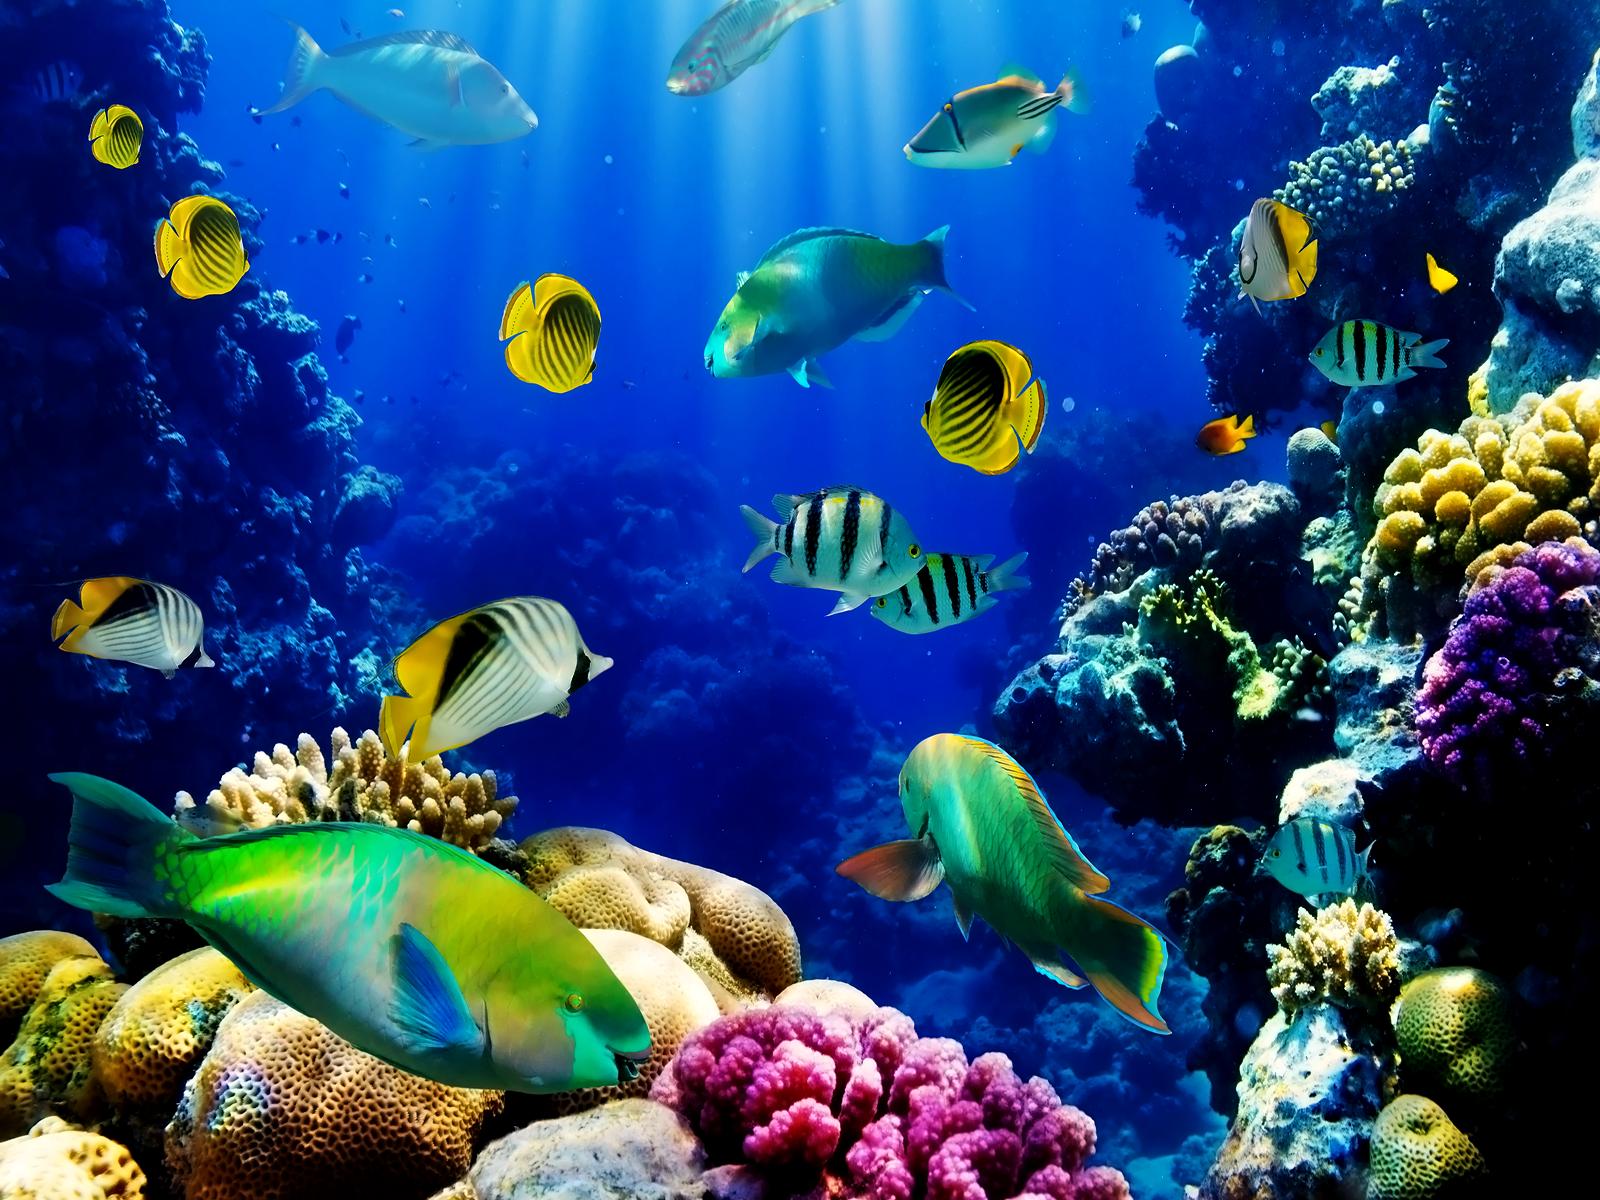 Virtual fish tank aquarium google - Desktop Fish Tank Live Wallpaper Dowload Bengal Tiger Wallpaper Hd